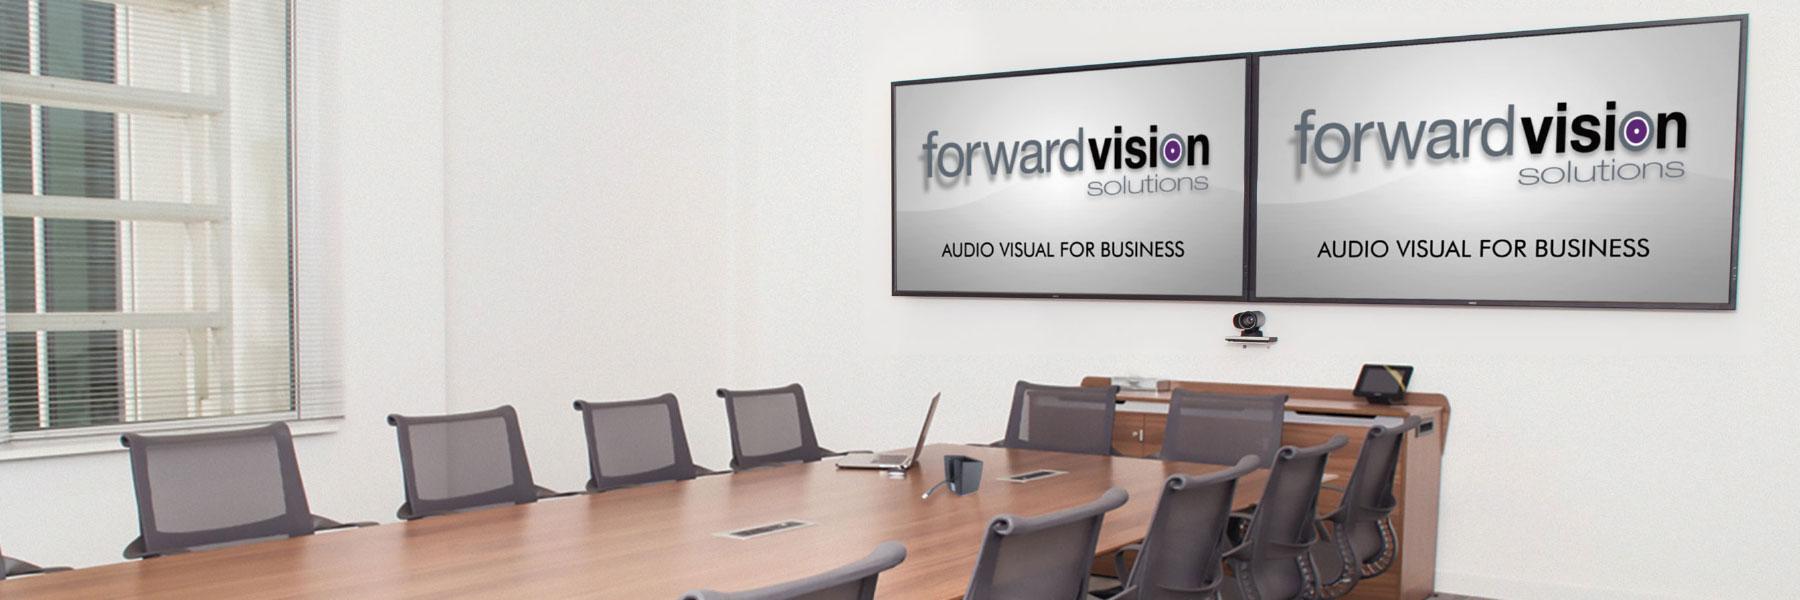 AV System Design room